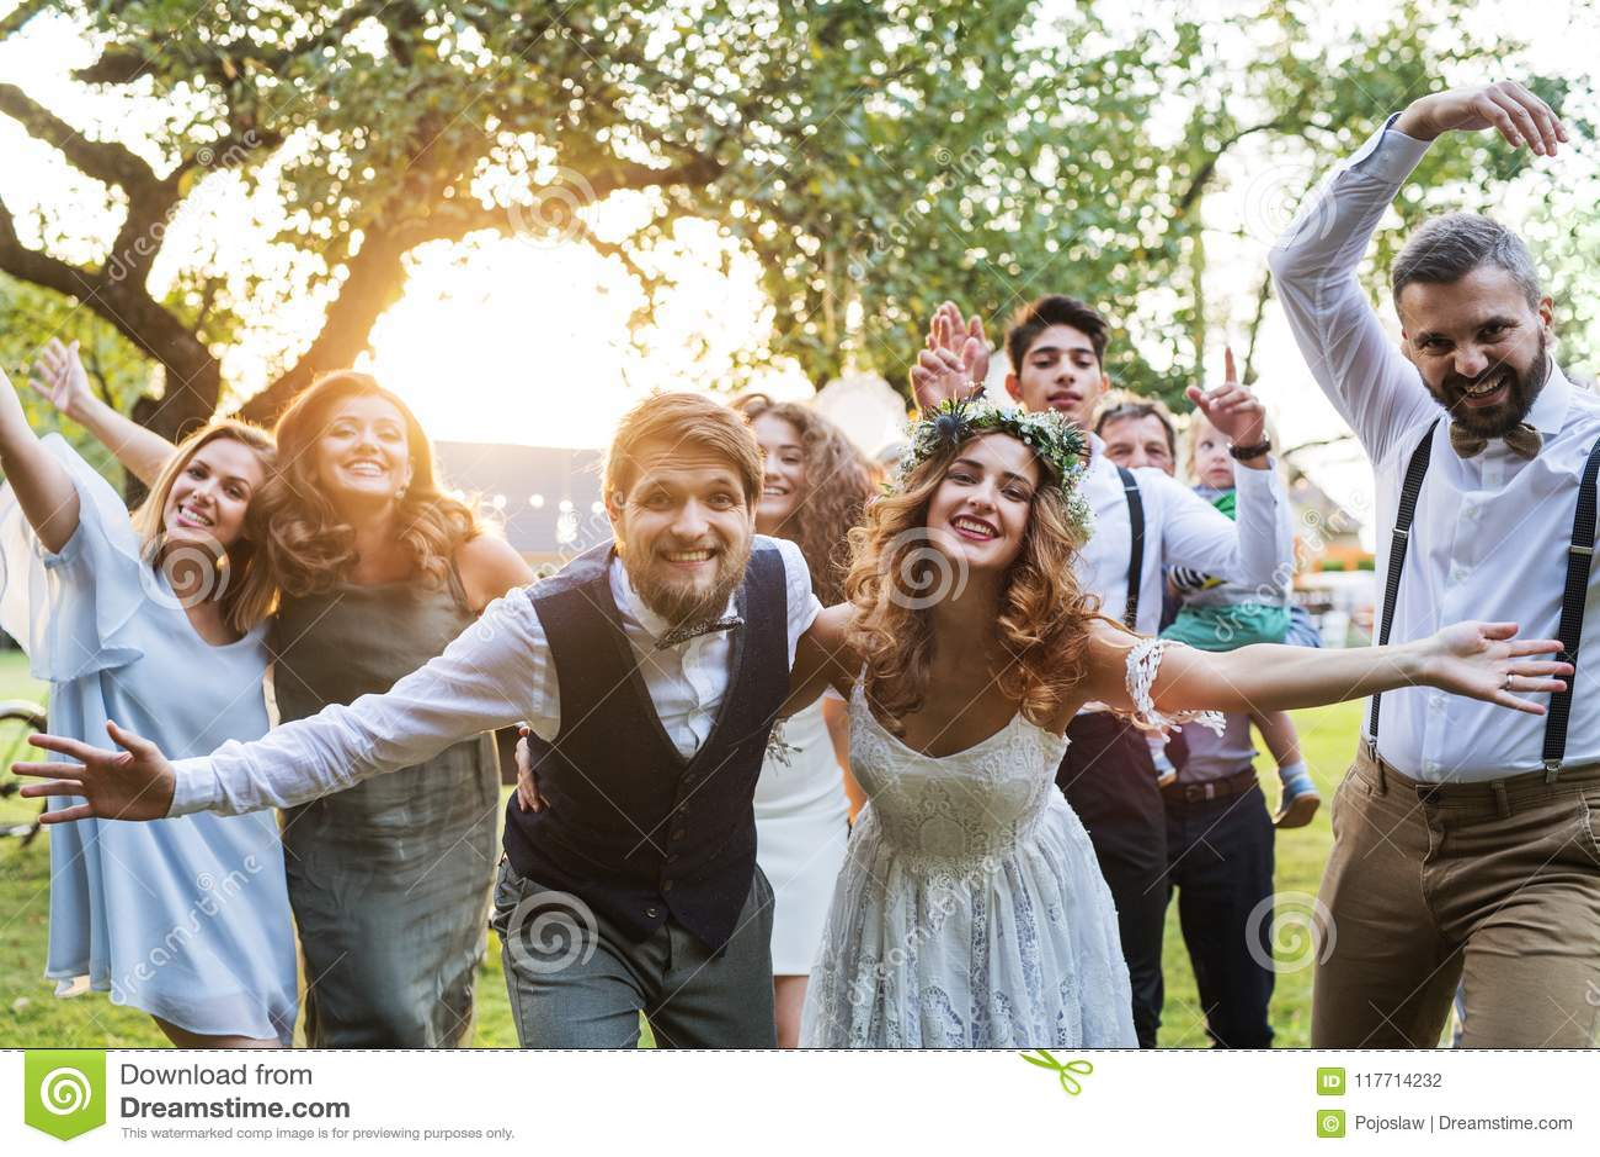 Невеста, groom, гости представляя для фото на приеме по случаю бракосочетания снаружи в задворк